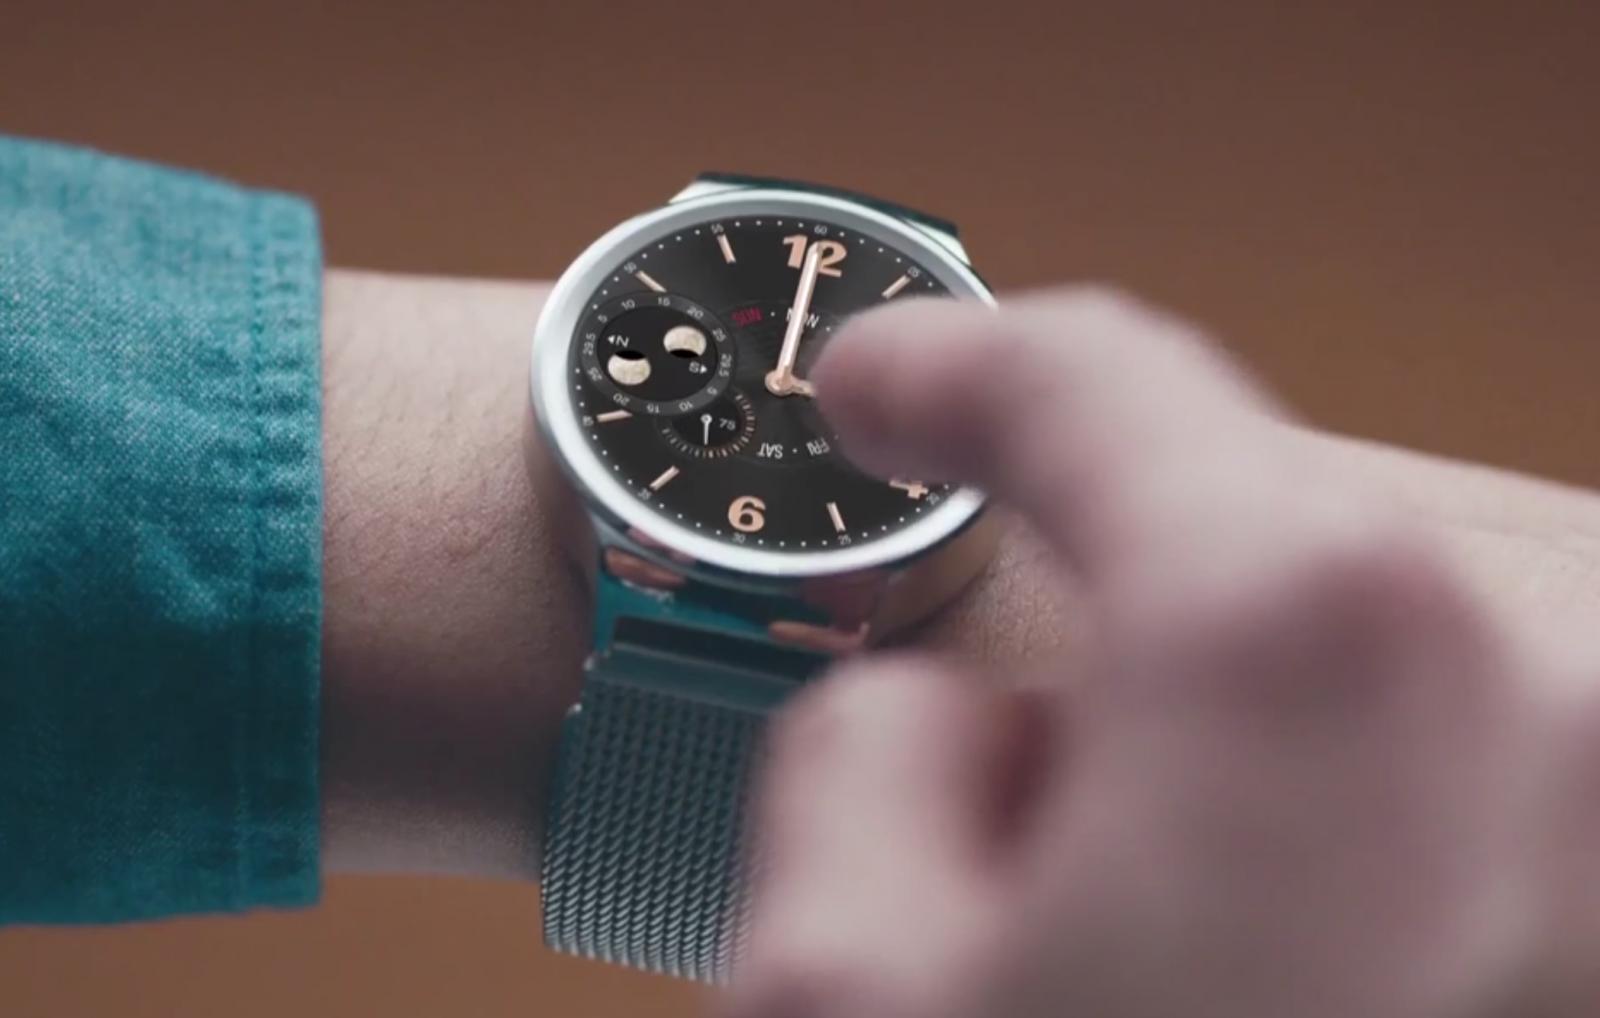 Huawei Watch release date